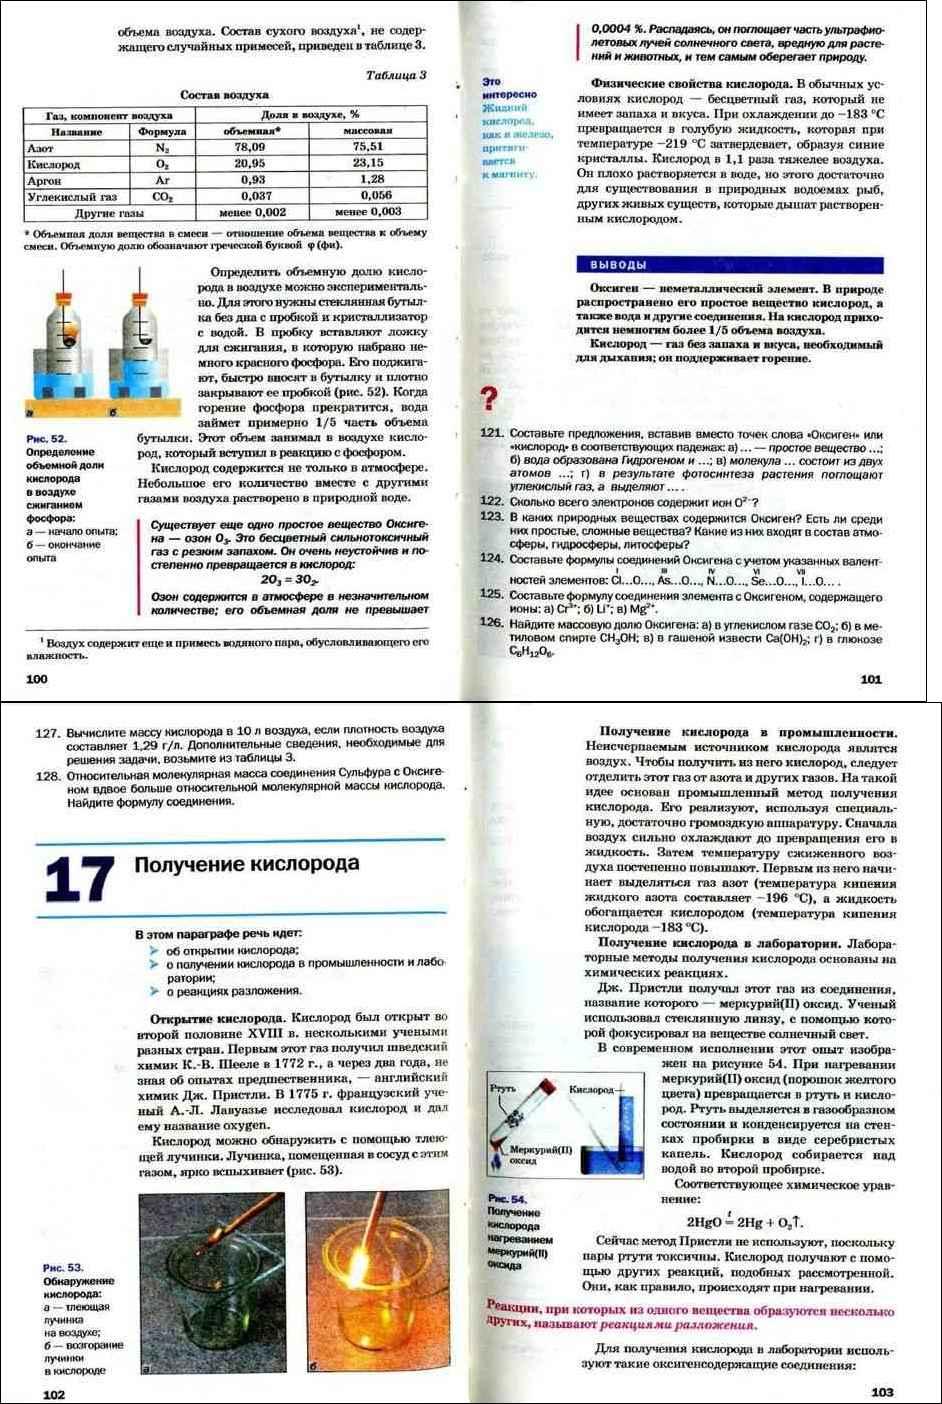 Решение задач по химии 7 класс попель решение задач по математике цт 2014